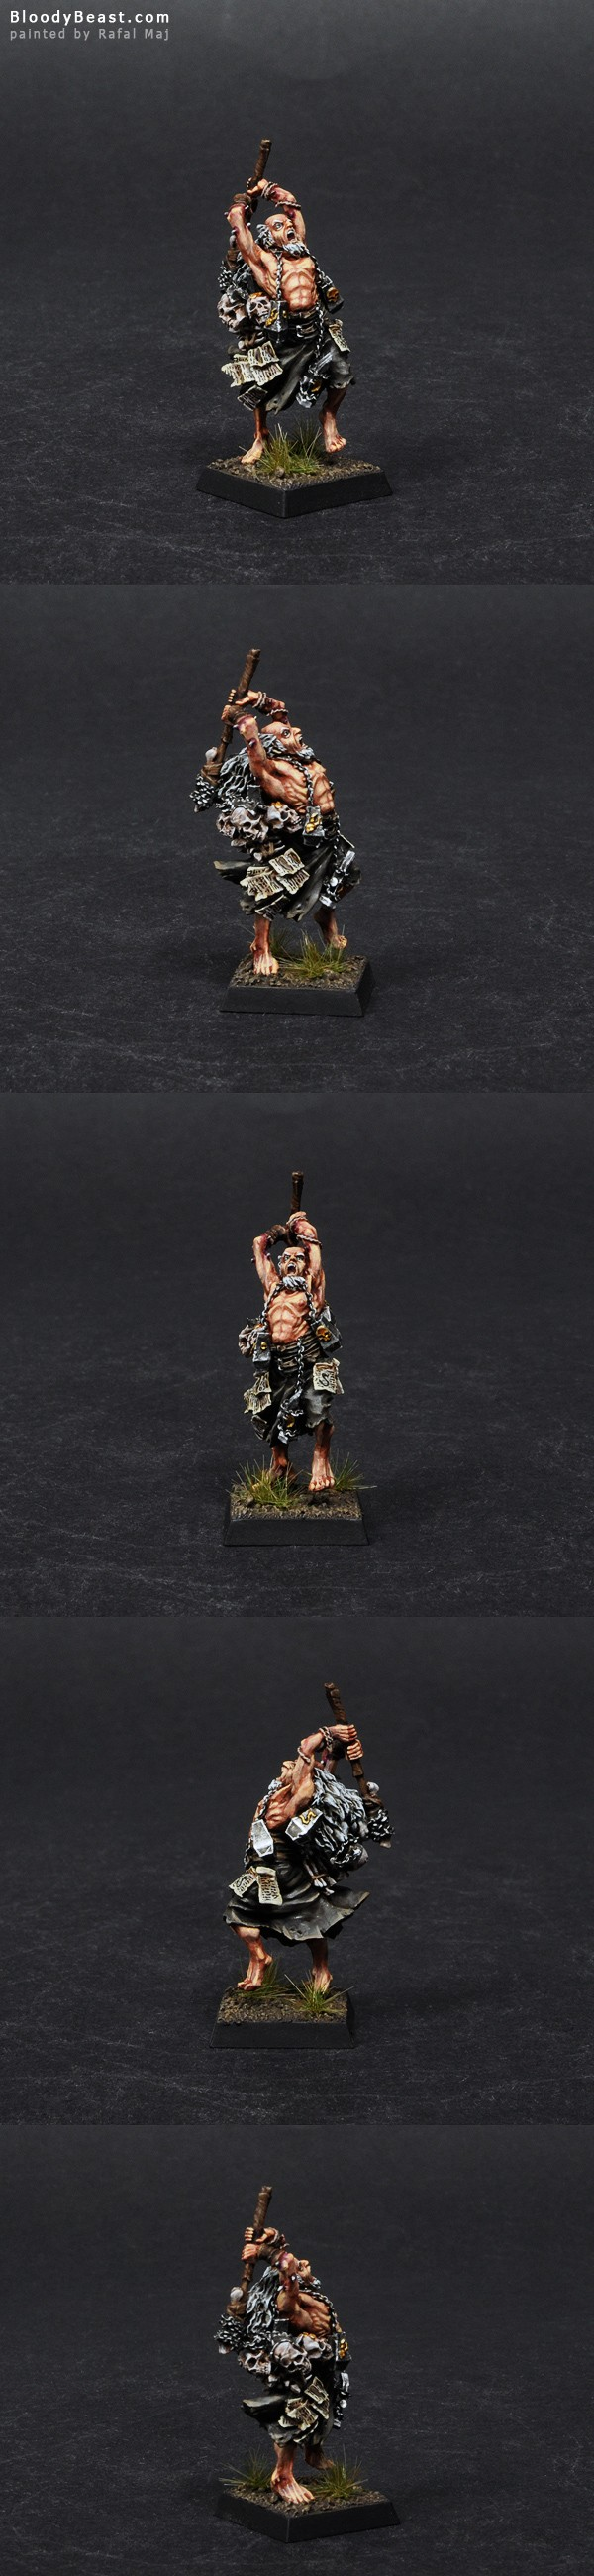 The Empire Warrior Priest